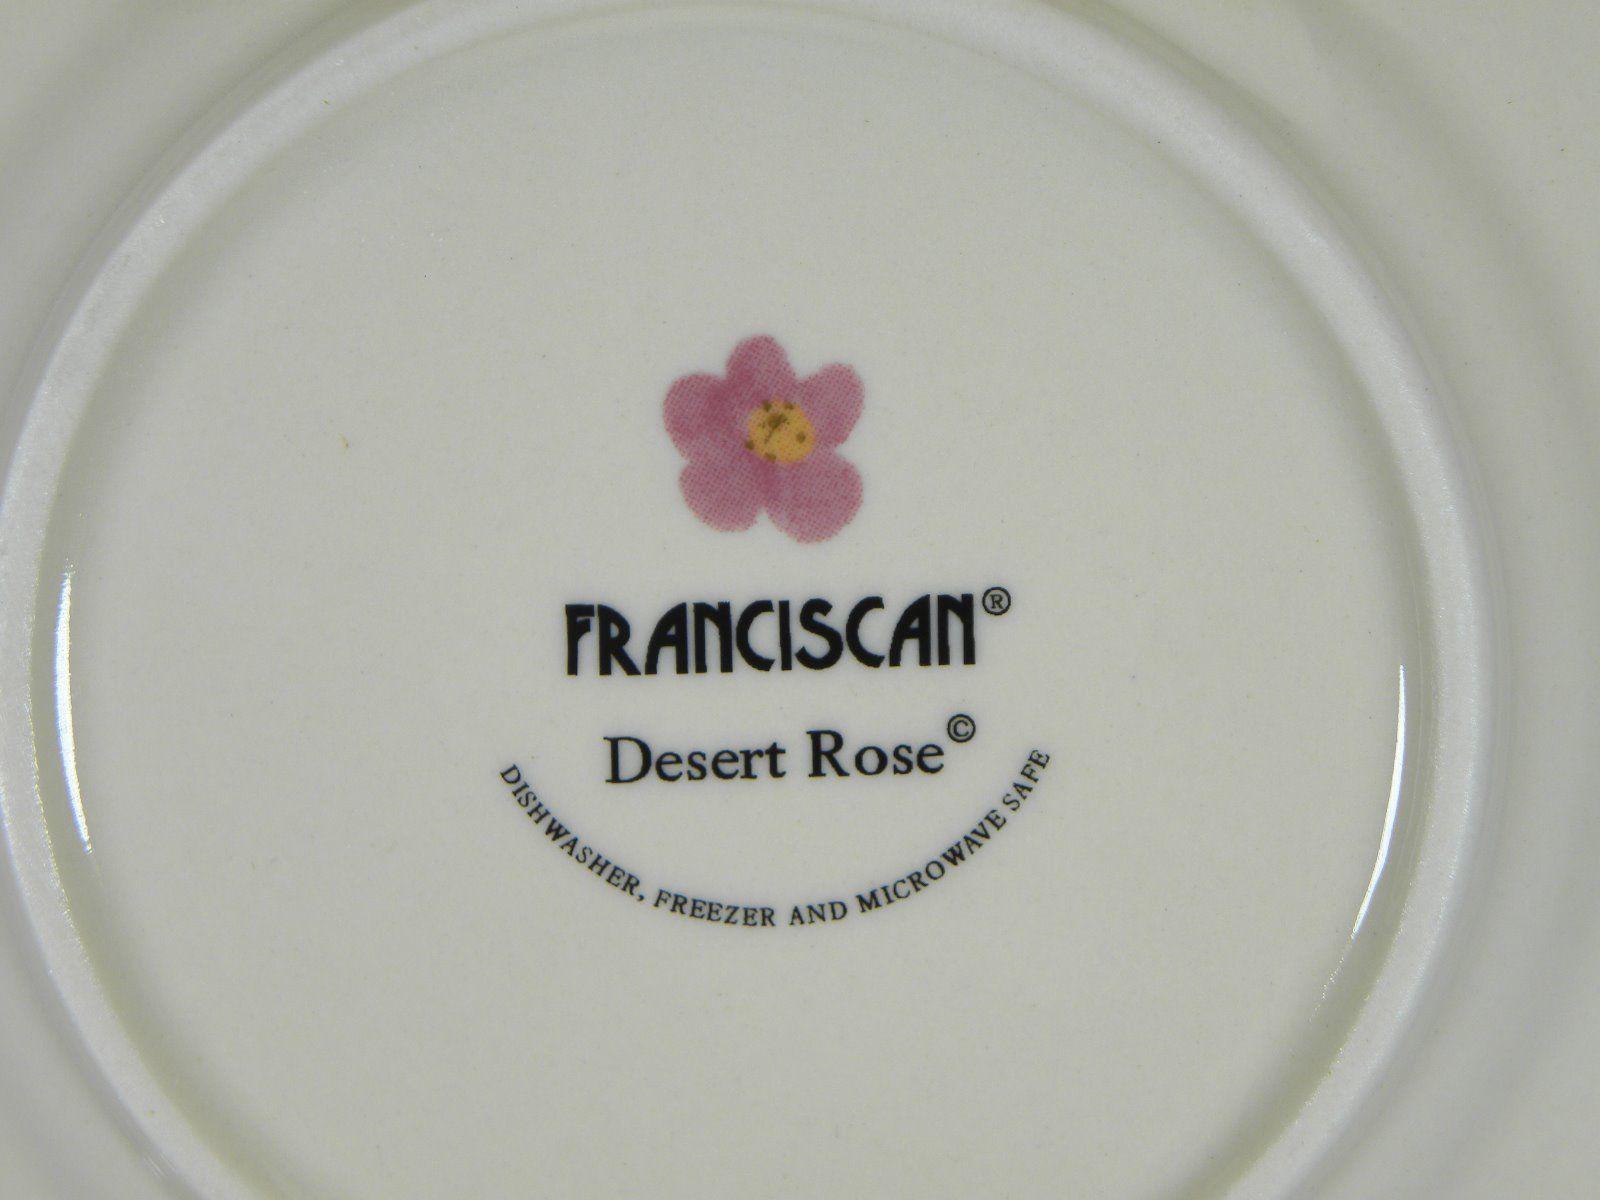 Franciscan Desert Rose Bread & Butter Plate BRAND NEW PRODUCTION